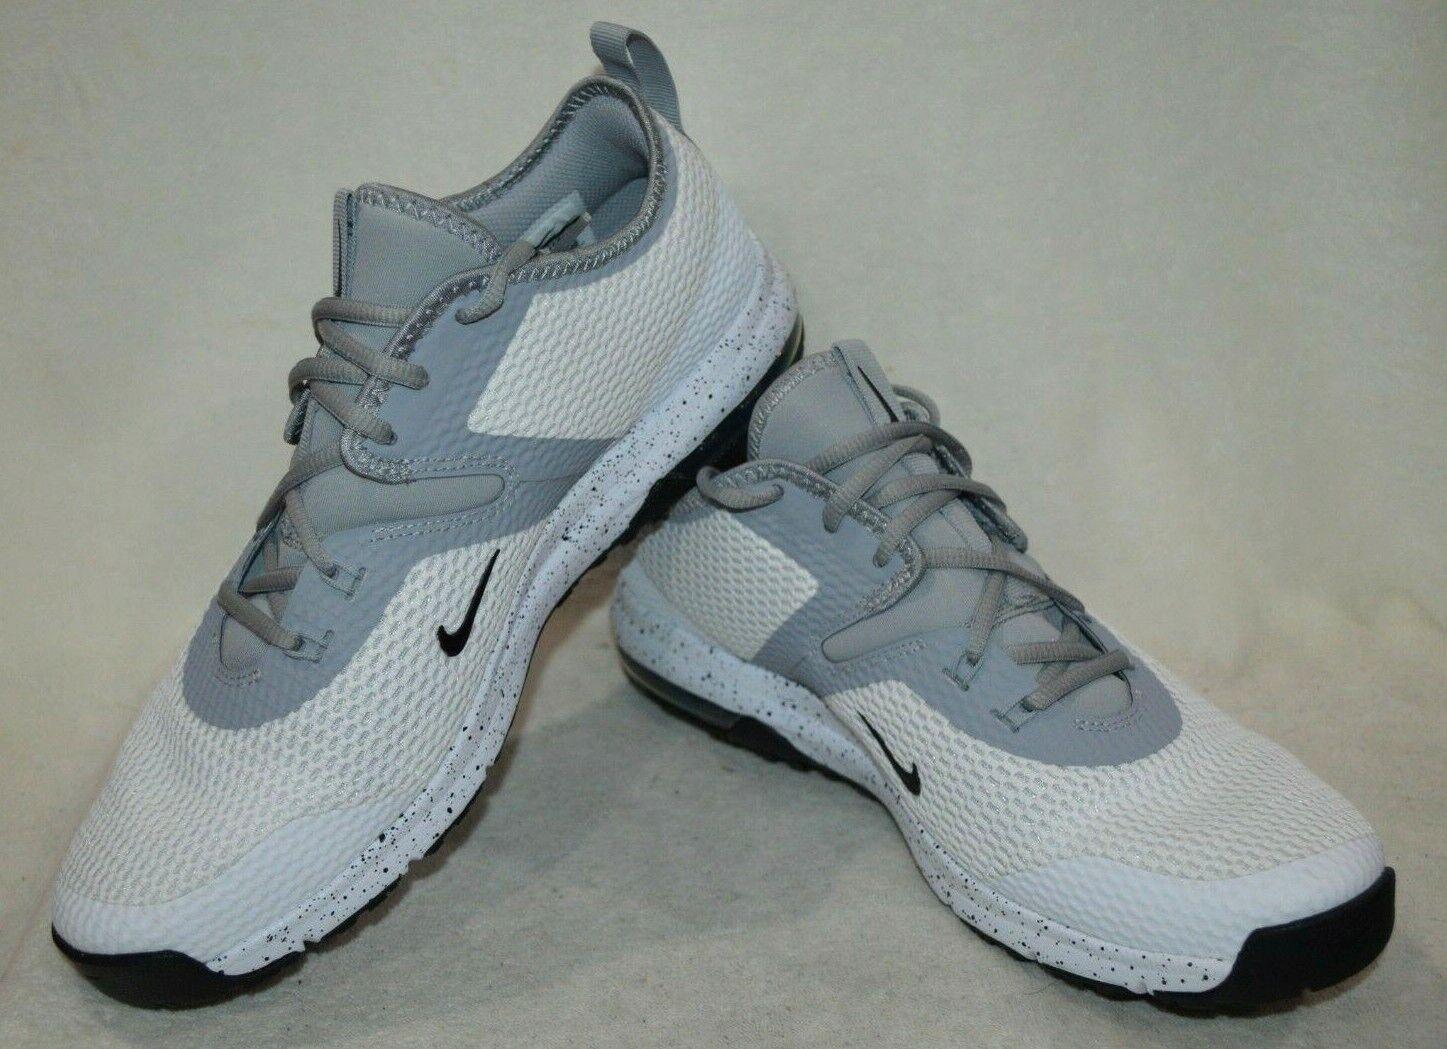 Nike AIR MAX tifa 2 Bianco Nero Grigio Uomo Sautope da Training-SZ 8.5 9 10.5 11 NWB Sautope classeiche da uomo